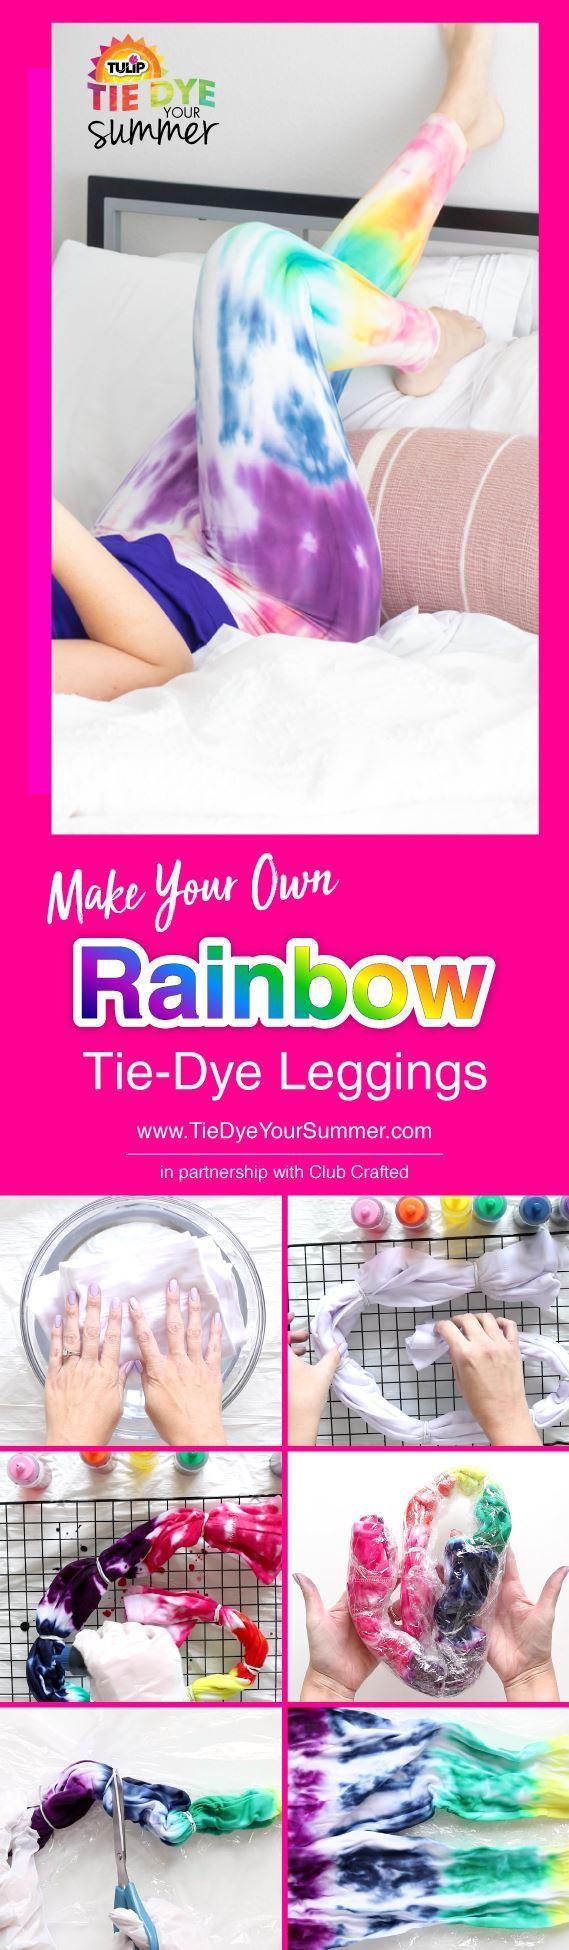 Make Your Own Rainbow Tie-Dye Leggings